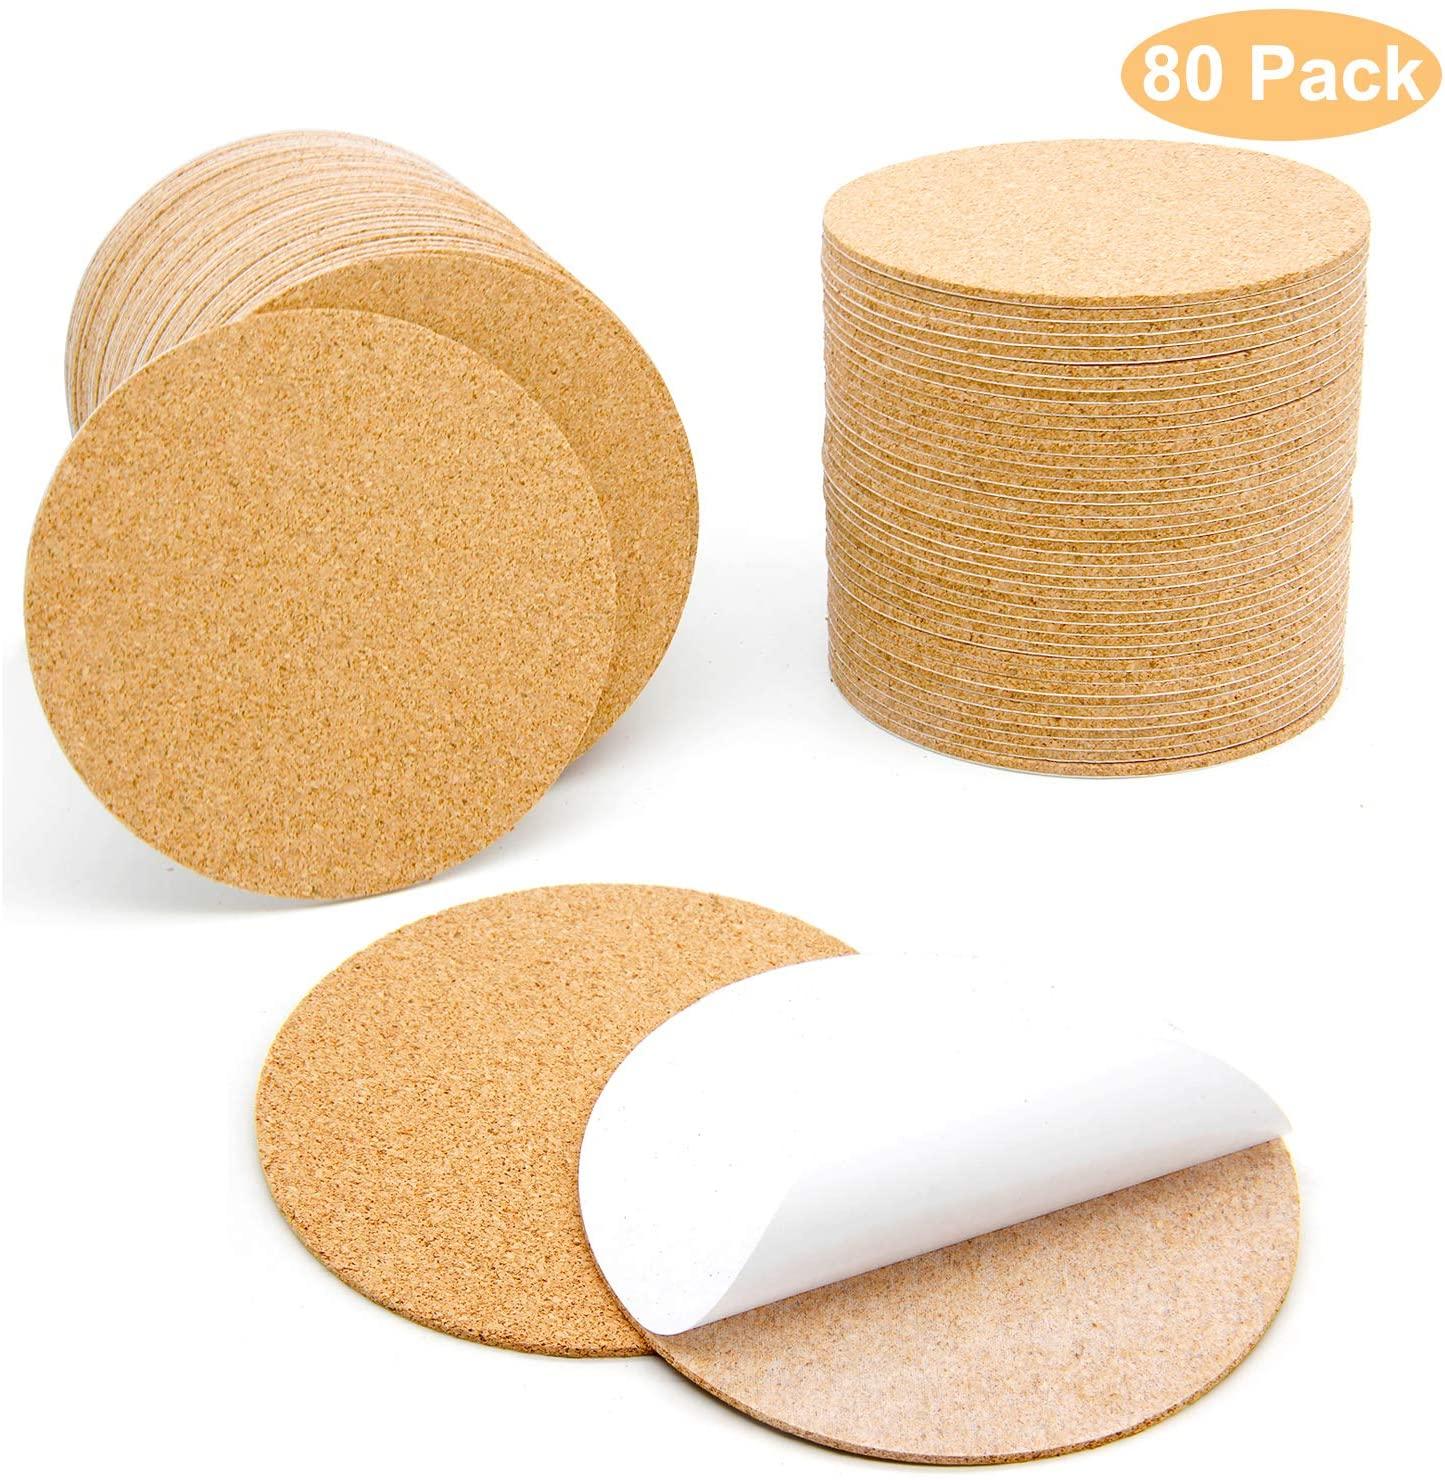 Blisstime 80 Pcs Self-Adhesive Cork Round for DIY Coasters, 4